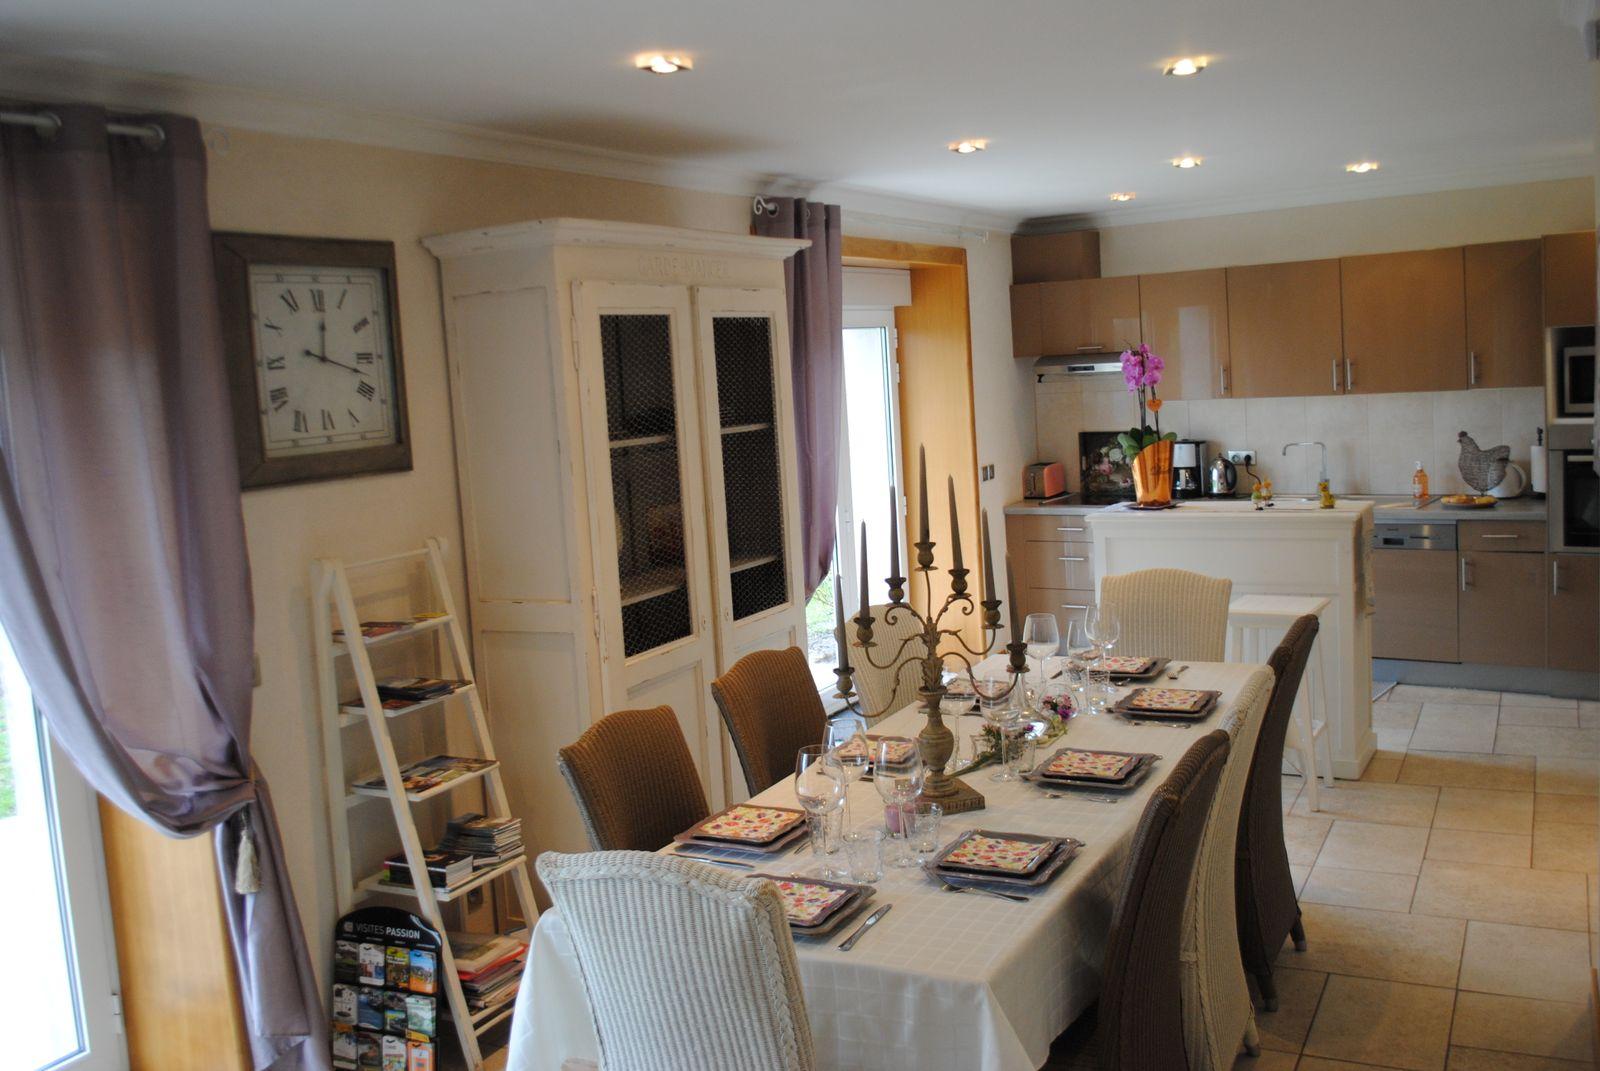 51G357 - L'Epine - Boursault - Gîtes de France Marne salle à manger